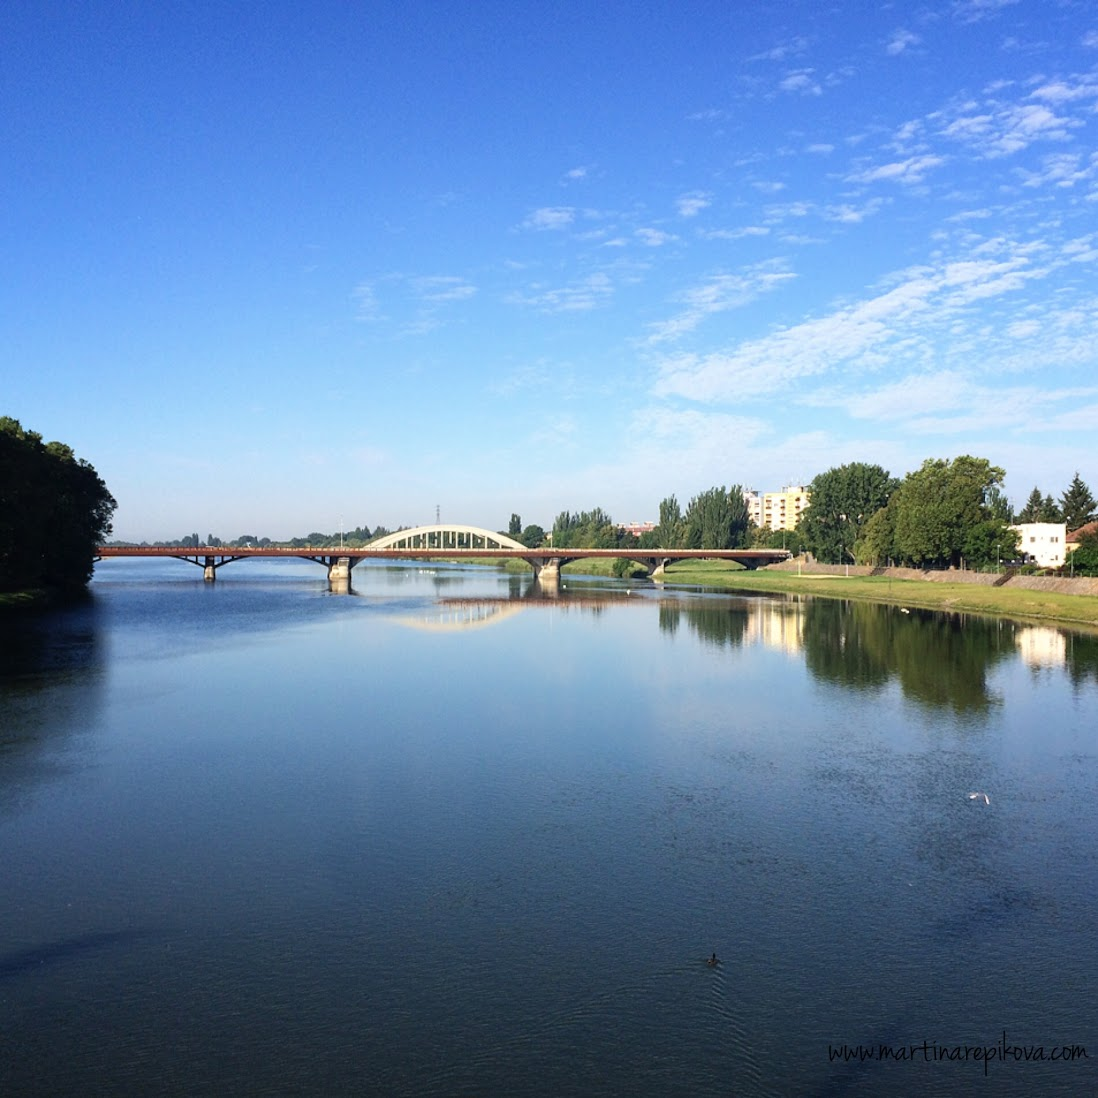 Piestany, Slovakia (original photo)